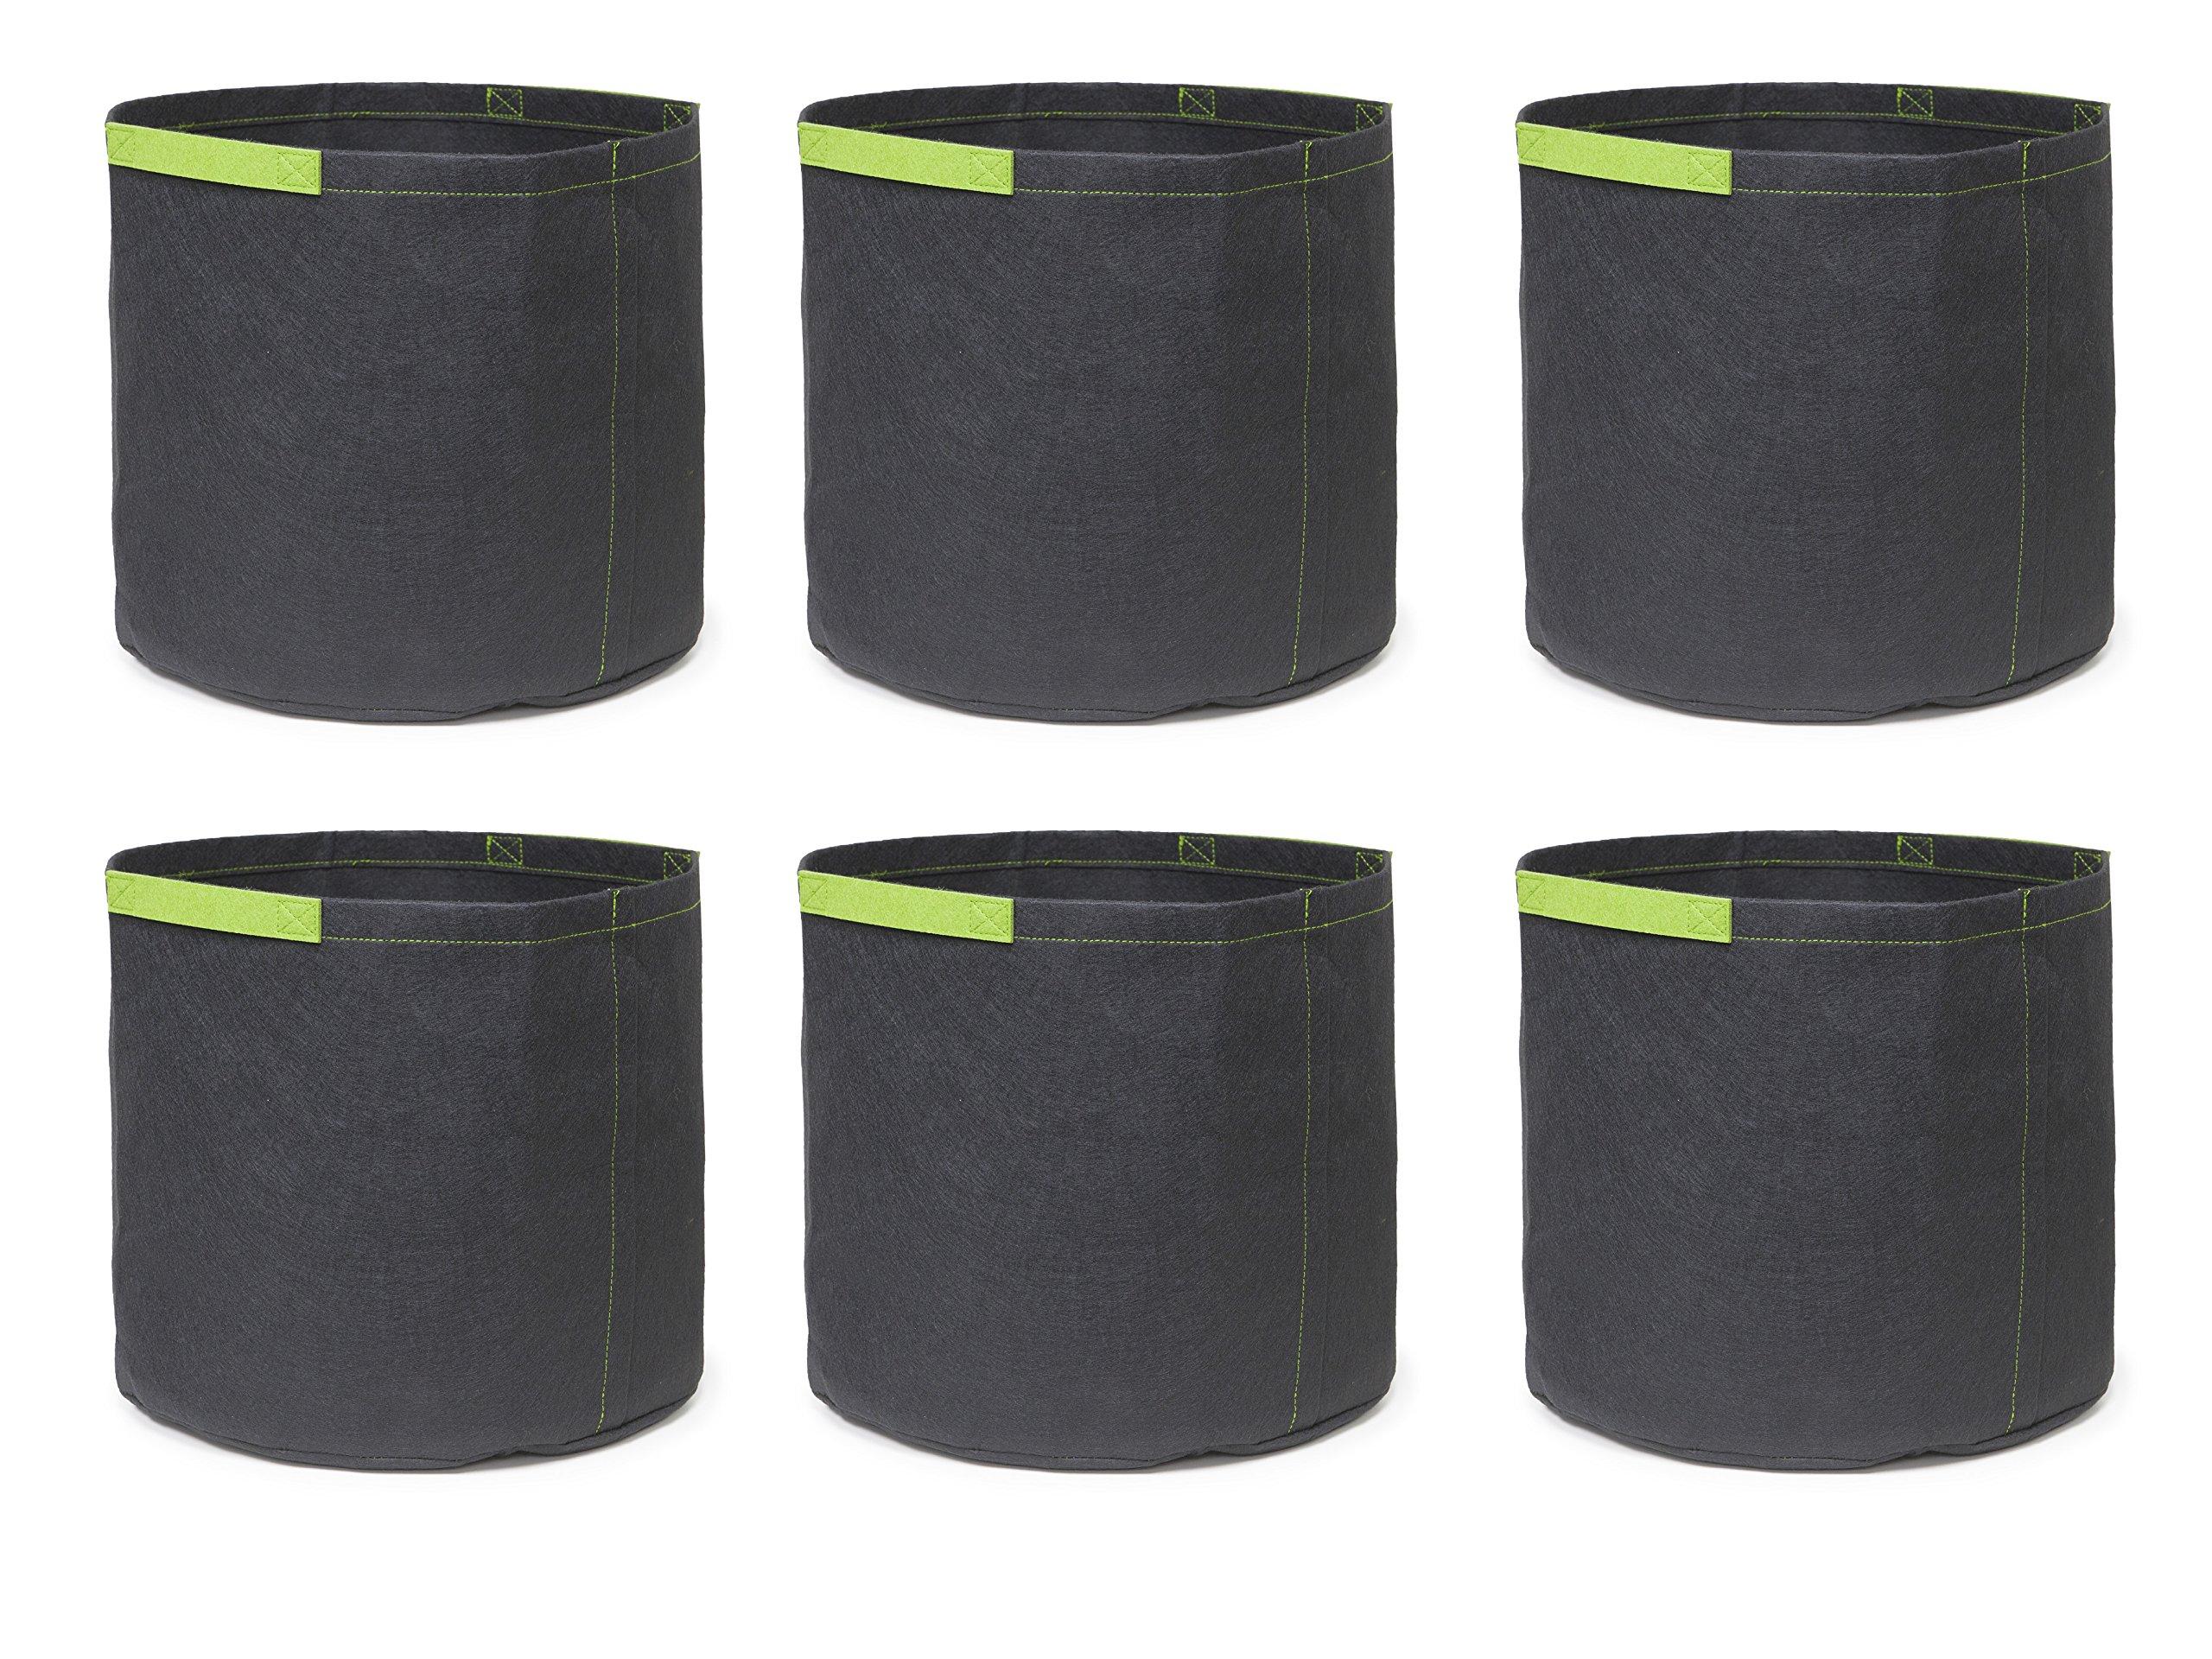 247Garden 6-Pack 3 Gallon Grow Bags/Aeration Fabric Pots w/Handles (Black w/Short Handles) by 247Garden